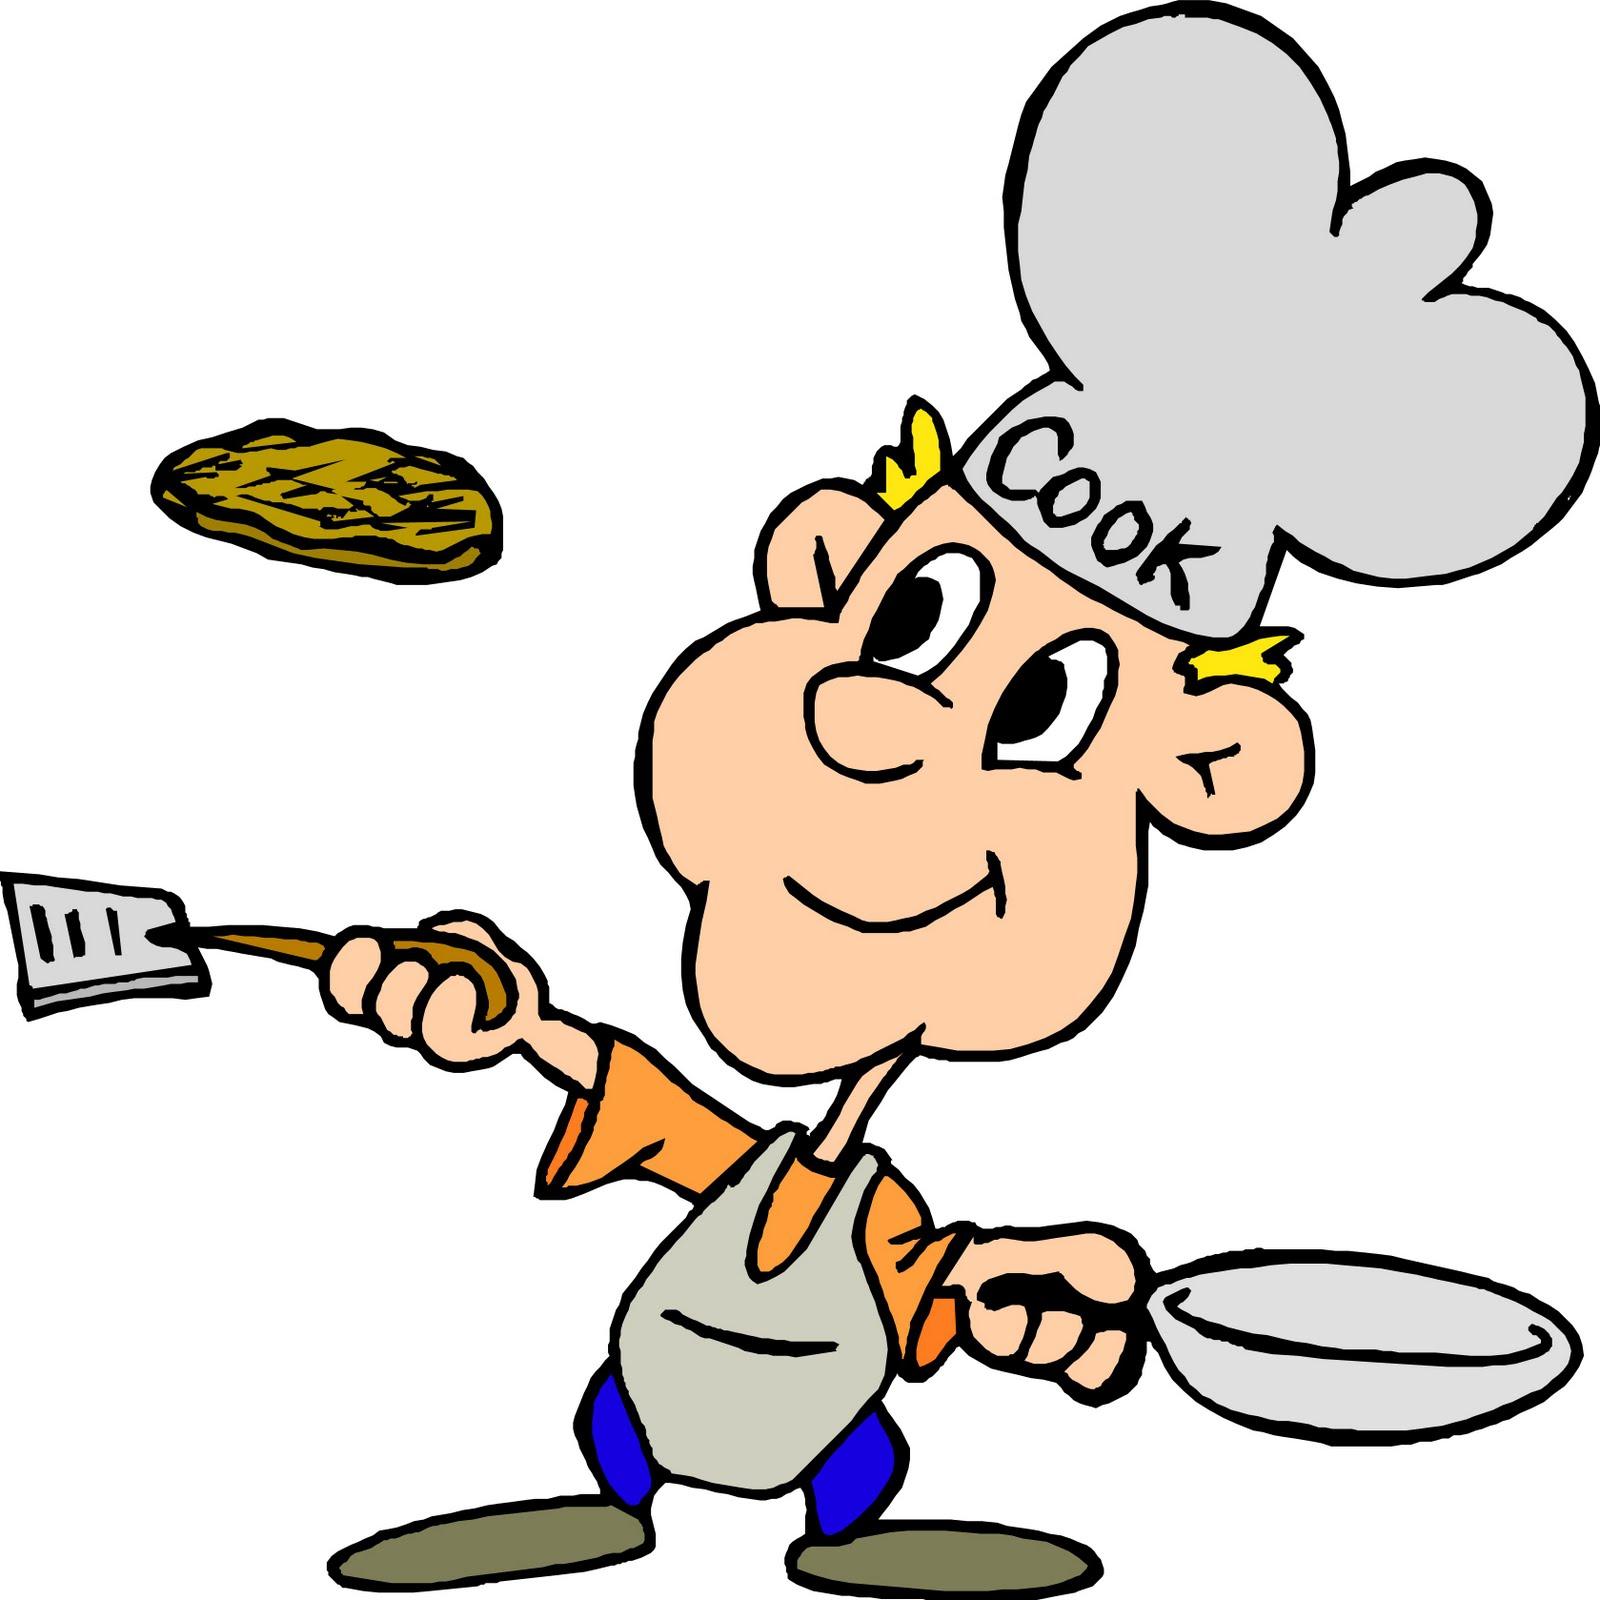 Pancake clipart men's breakfast. Free chef school cliparts